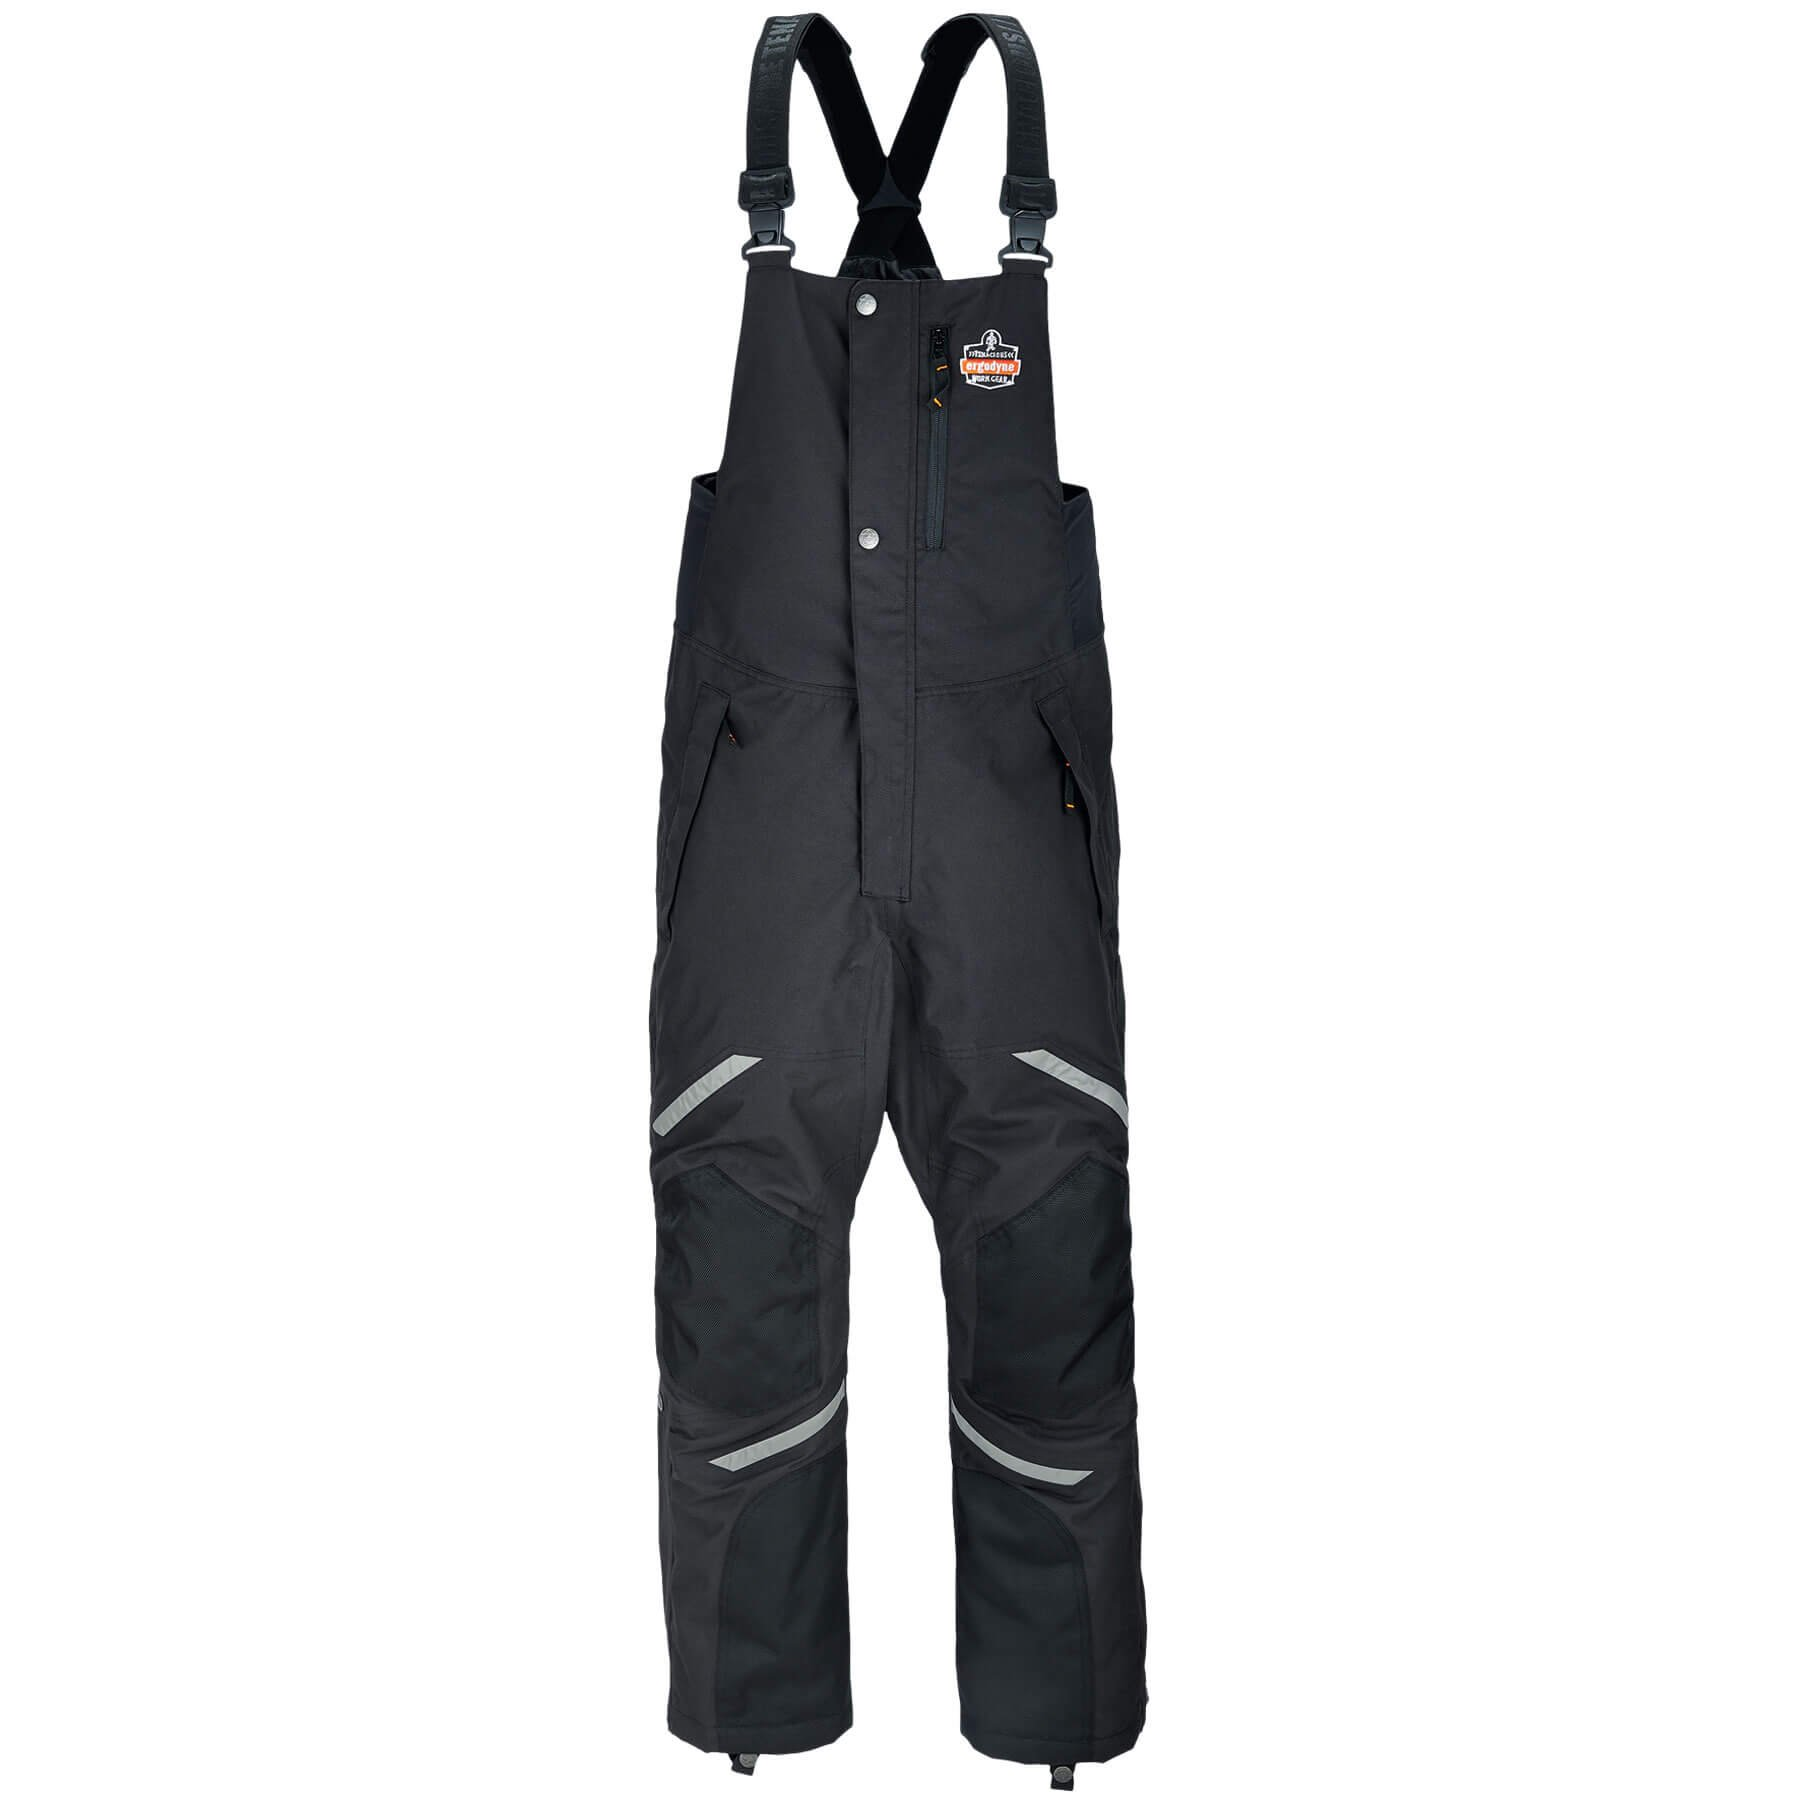 Ergodyne N-Ferno 6471 Men's Winter Thermal Work Bib Overalls, Black, 2XL